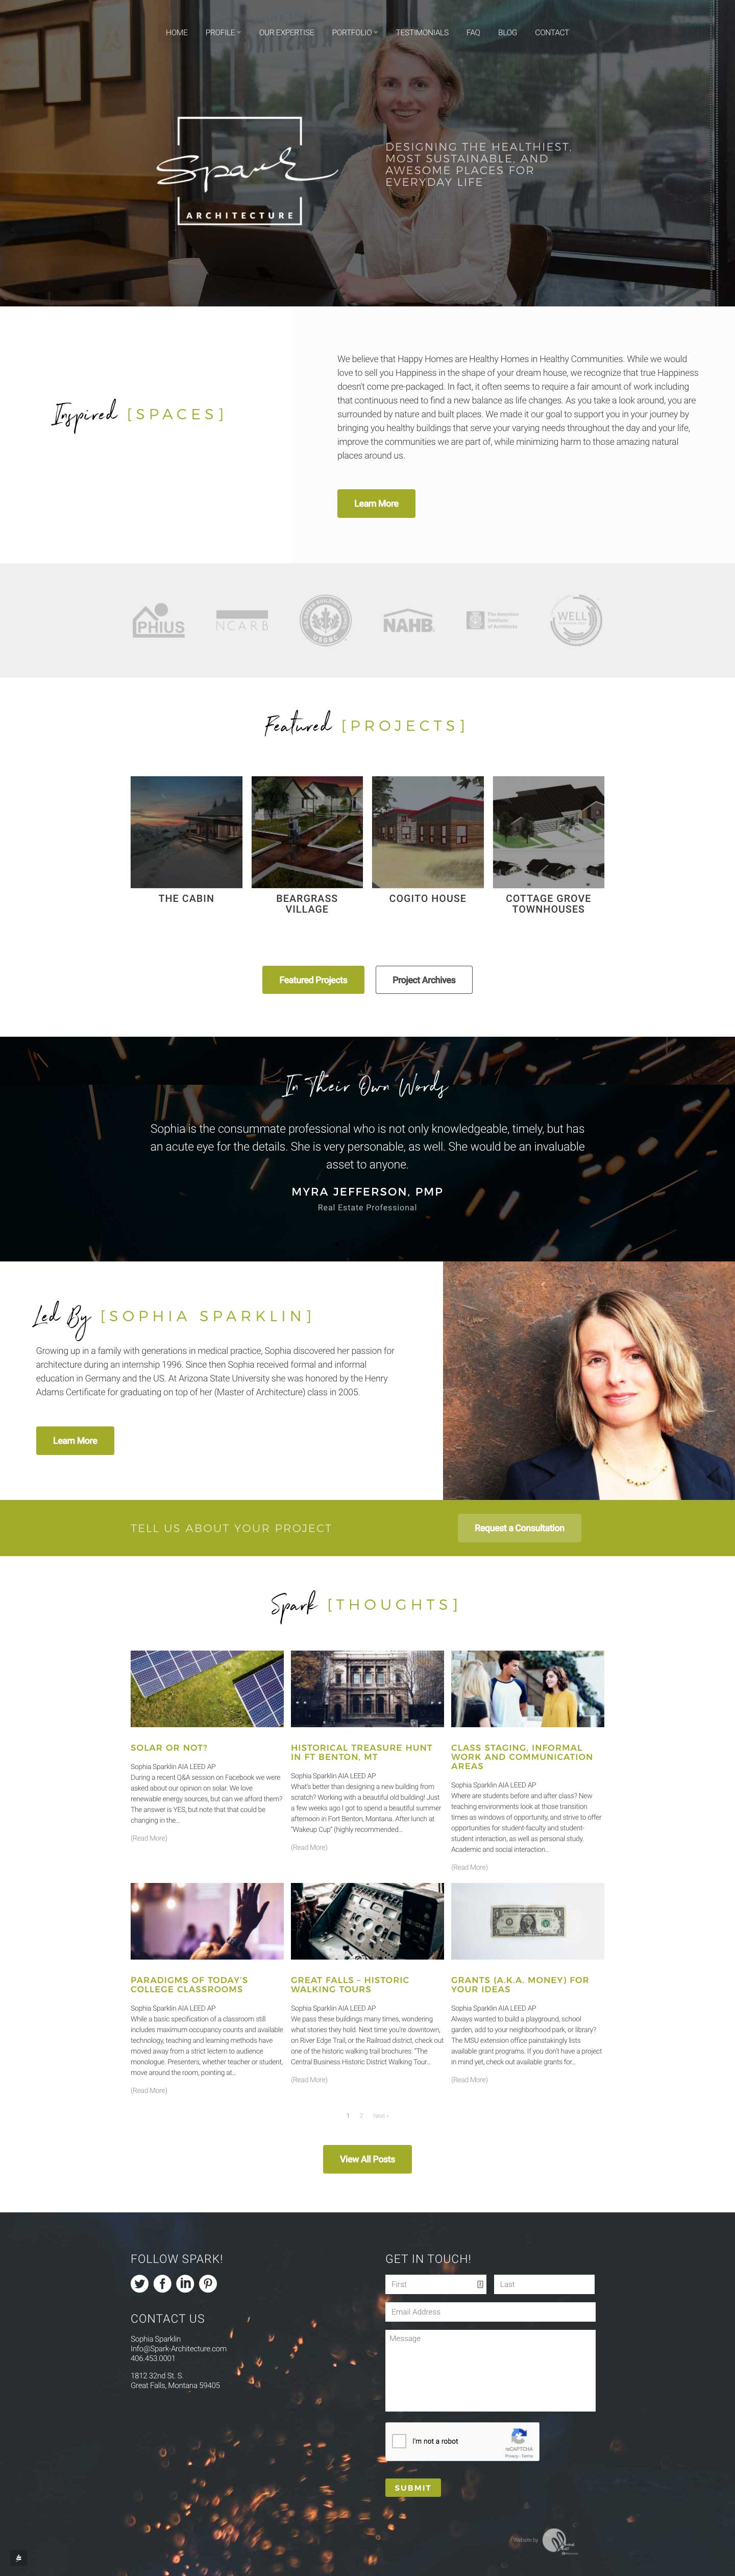 UK Functional Medicine Website Design